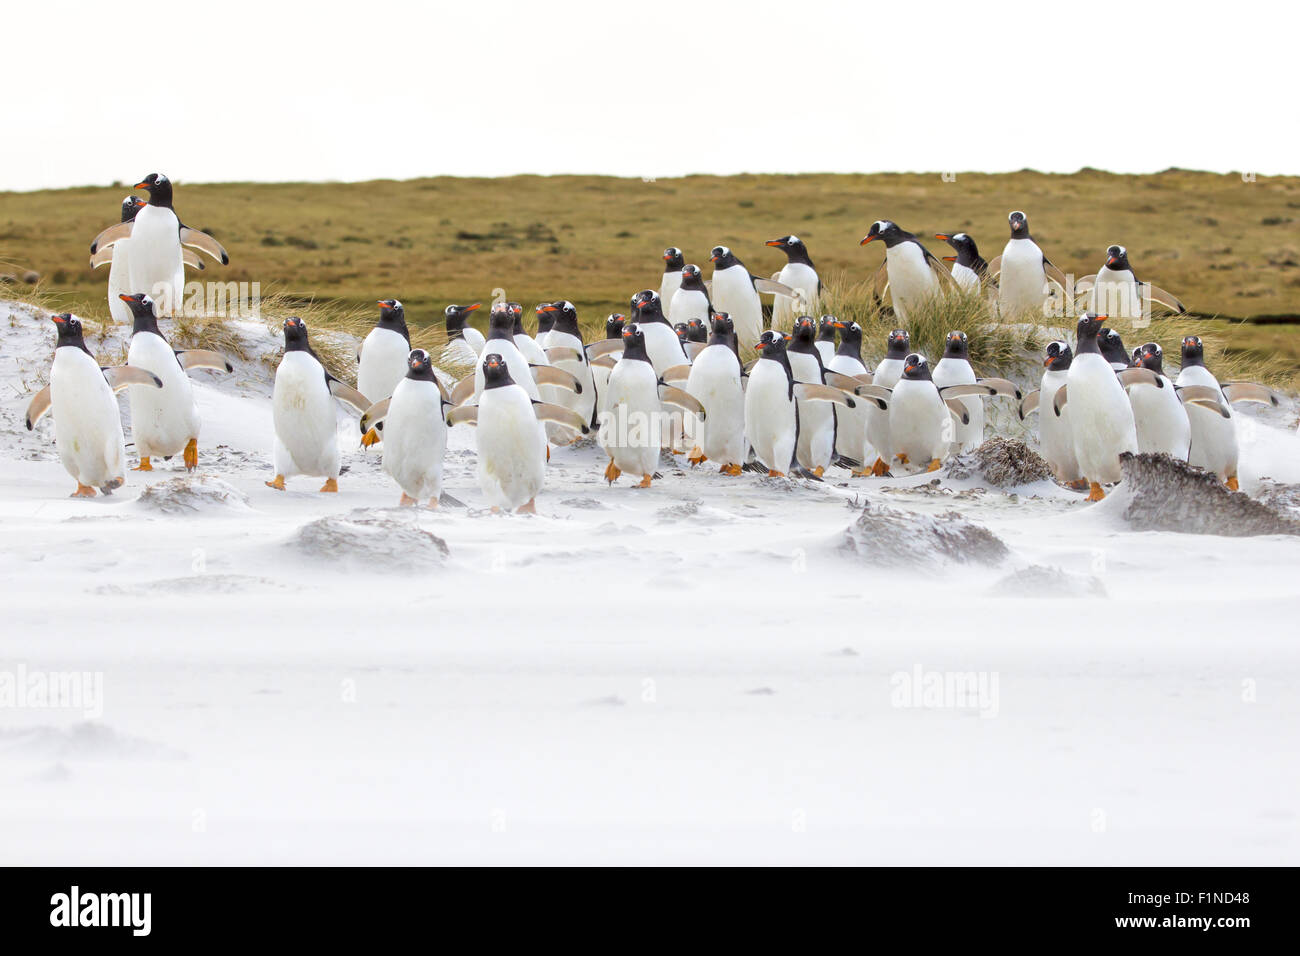 Gentoo penguin colony on the beach, Falkland Islands - Stock Image